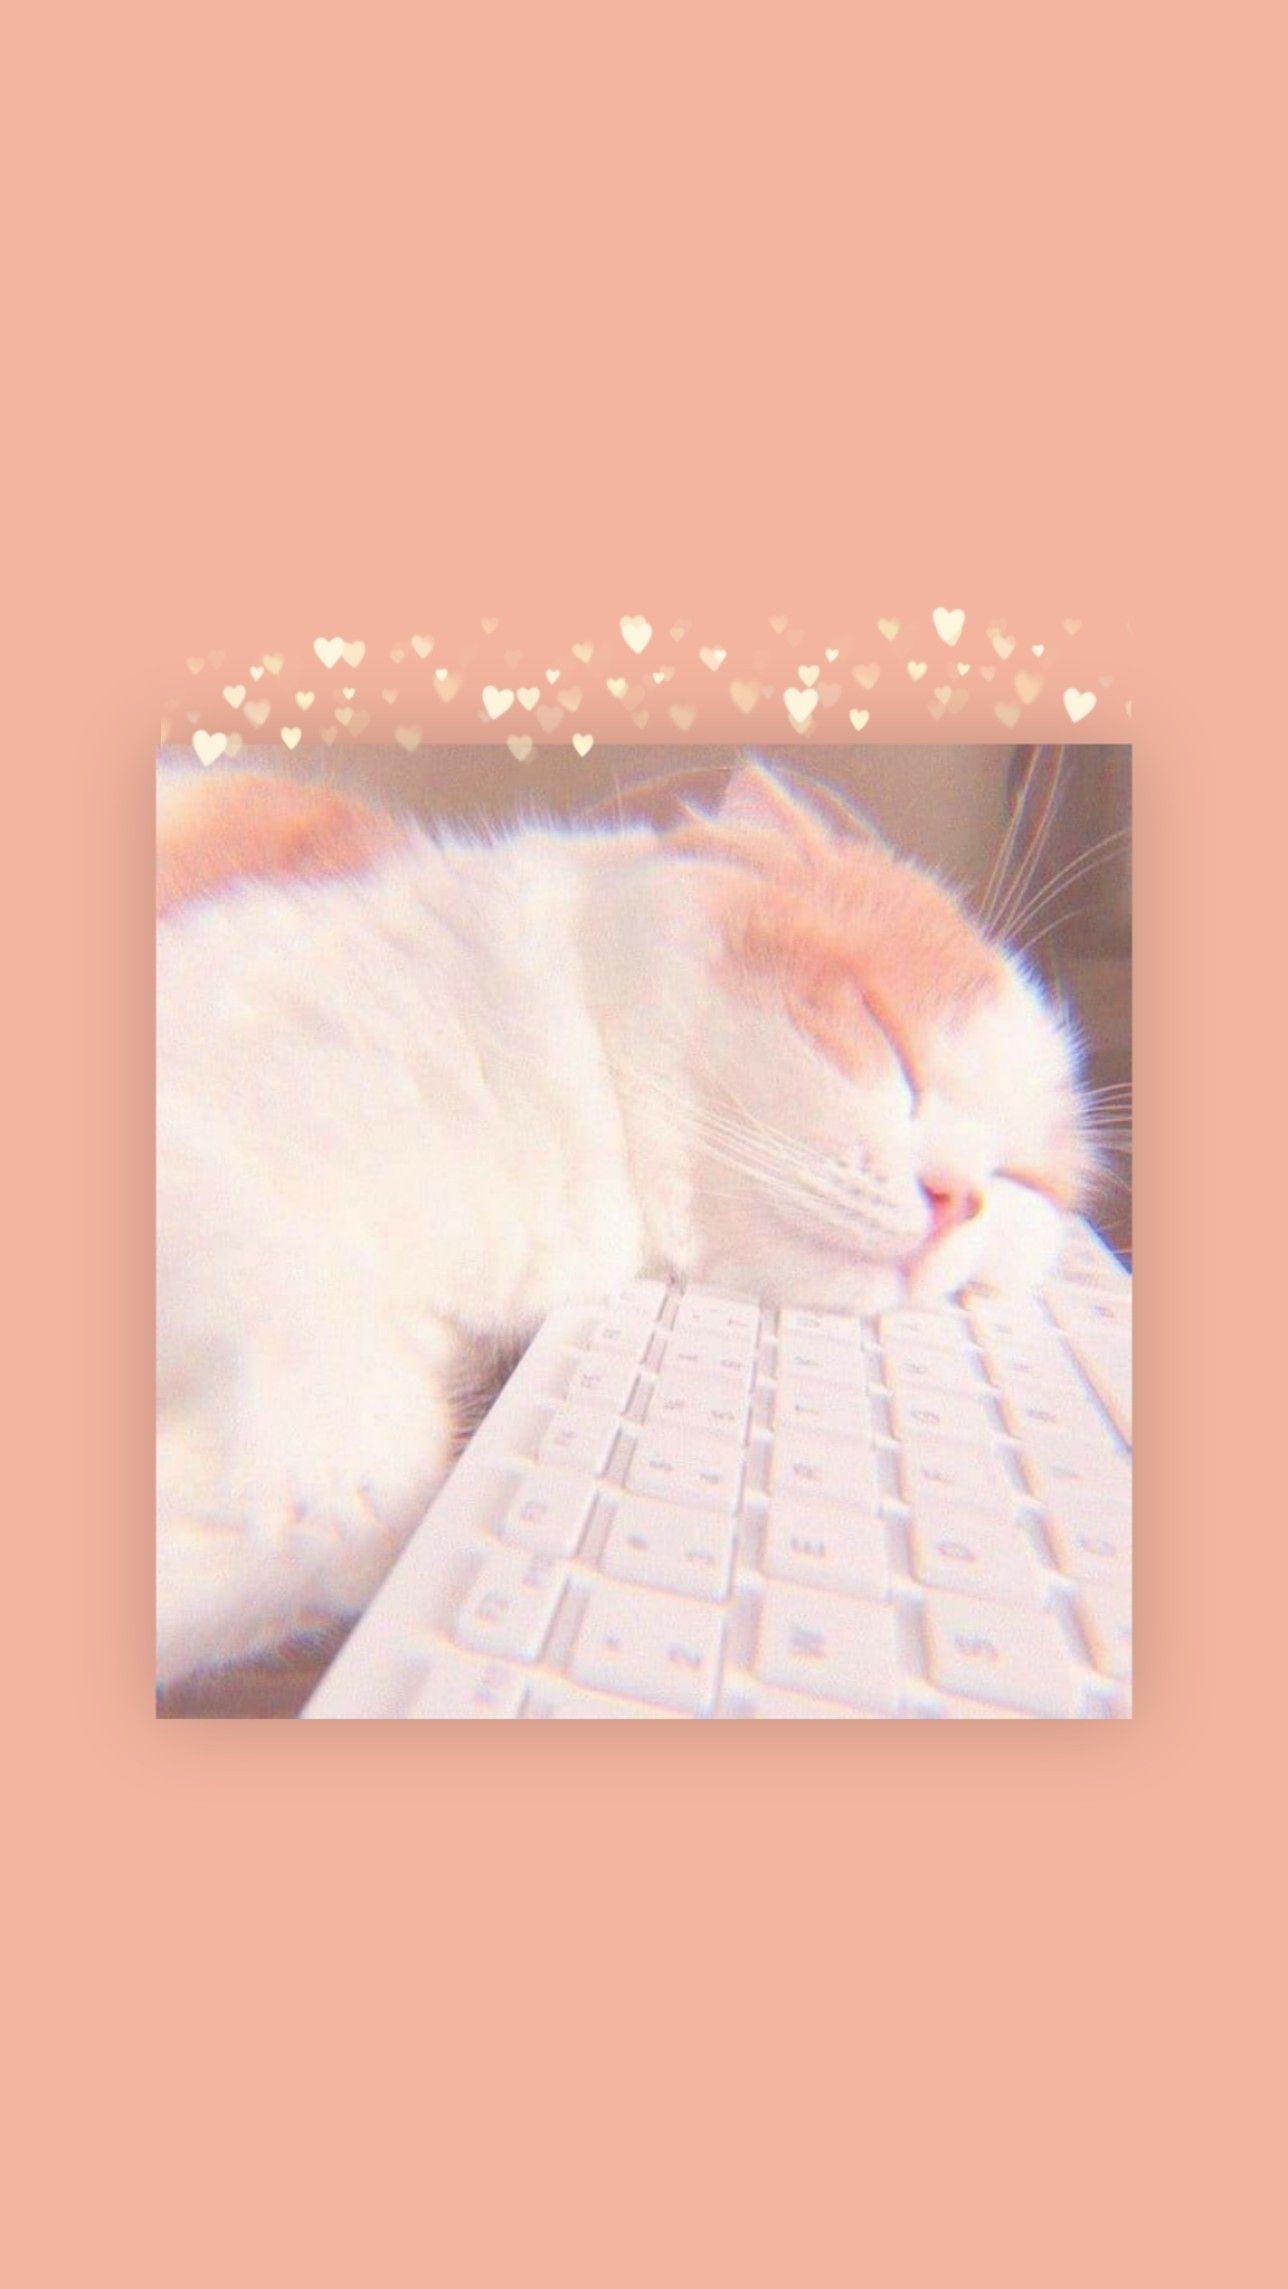 Cute Cat Aesthetic Wallpaper Seni Gelap Anak Kucing Lucu Kartu Ulang Tahun Buatan Tangan Cute cat wallpaper images